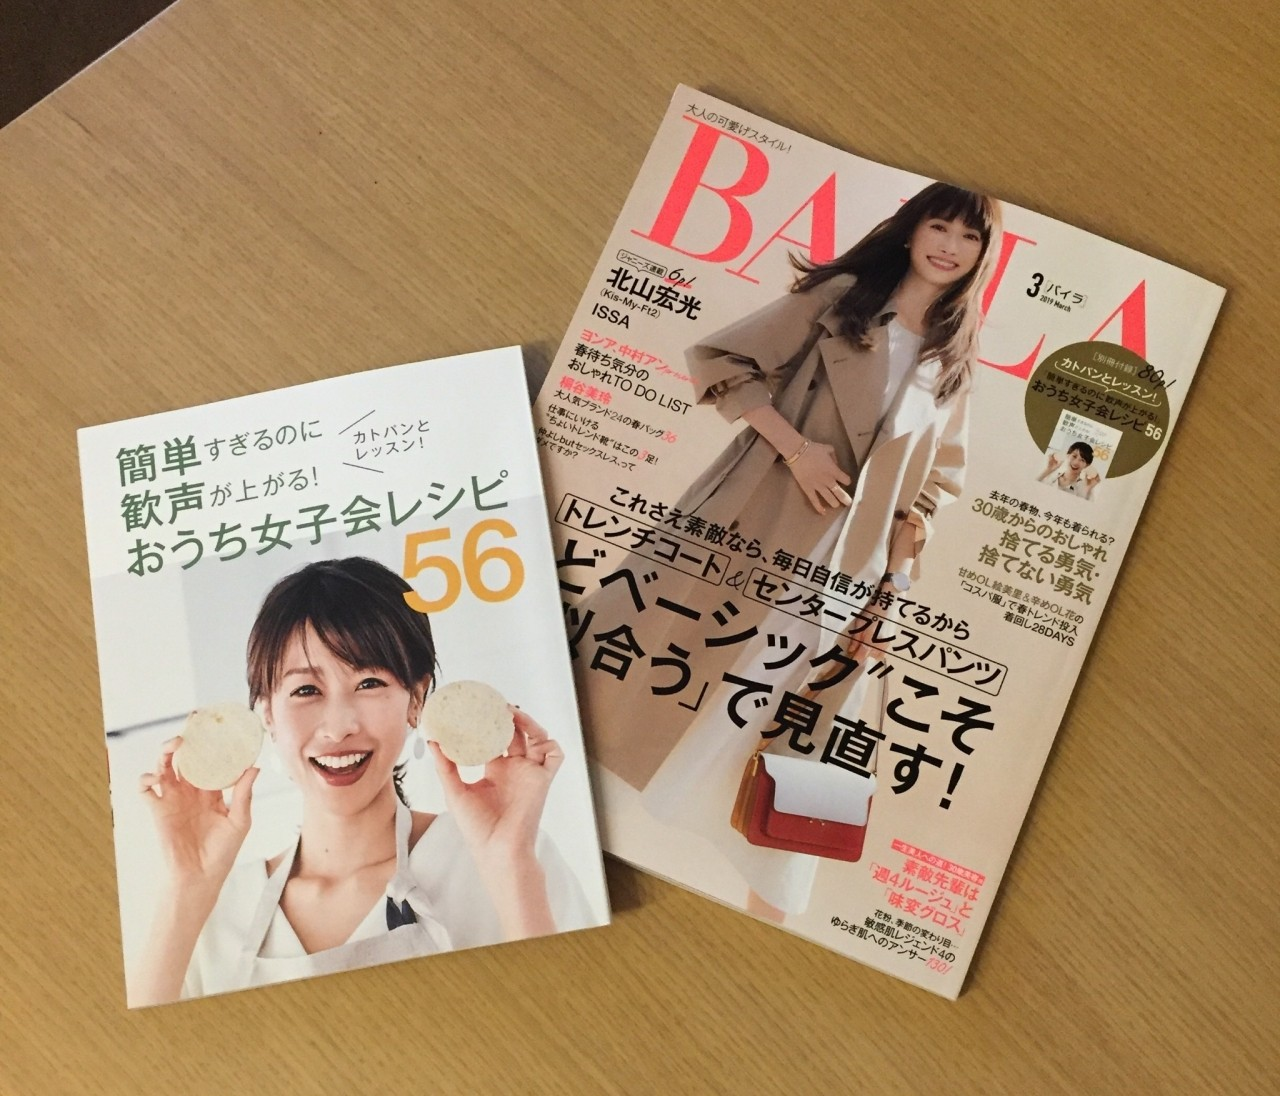 BAILA3月号の見どころをレポート!